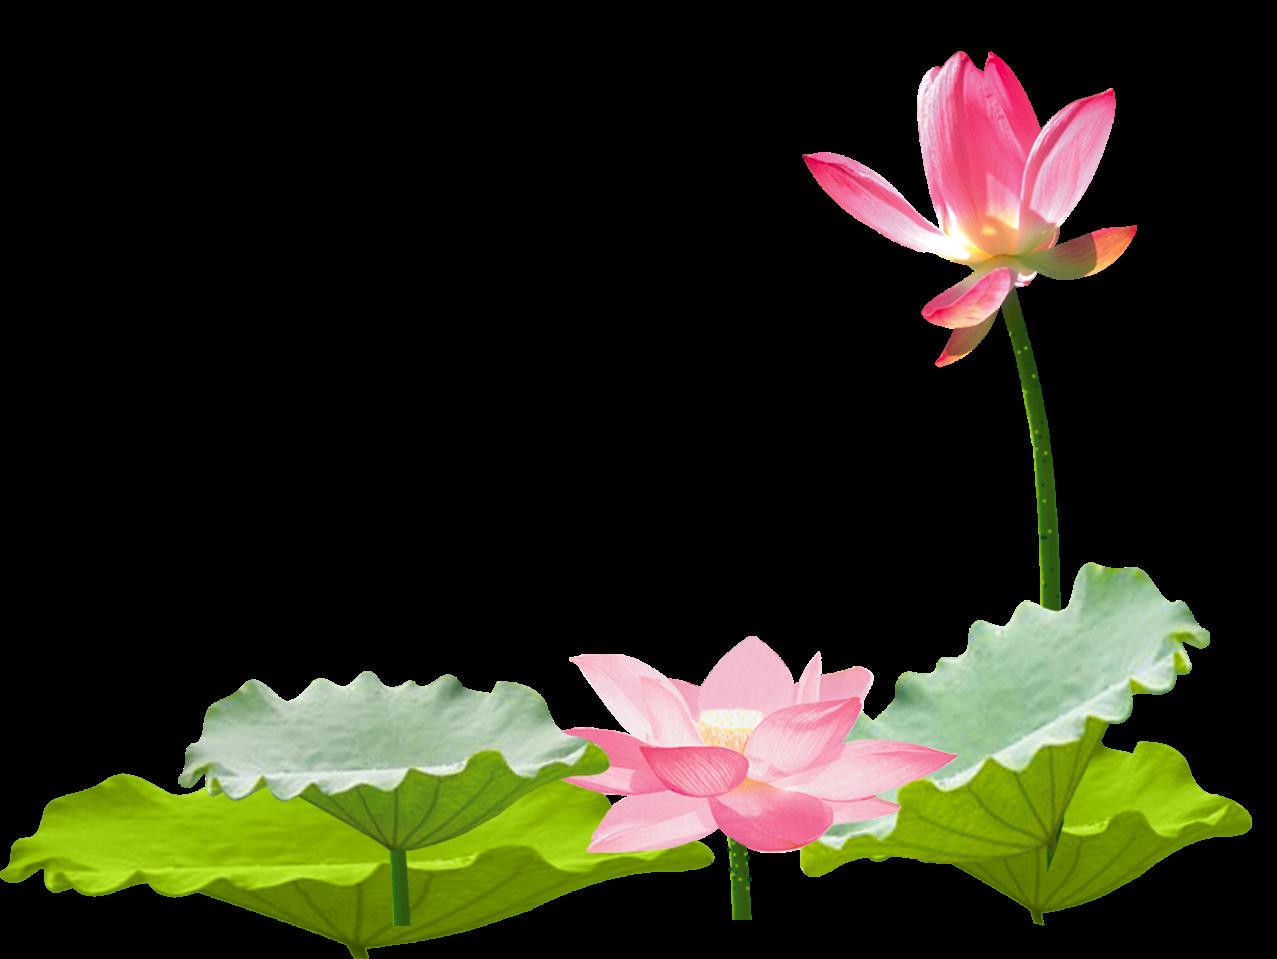 Asian flower clipart banner stock lotus flower chinese asian ftestickers... banner stock